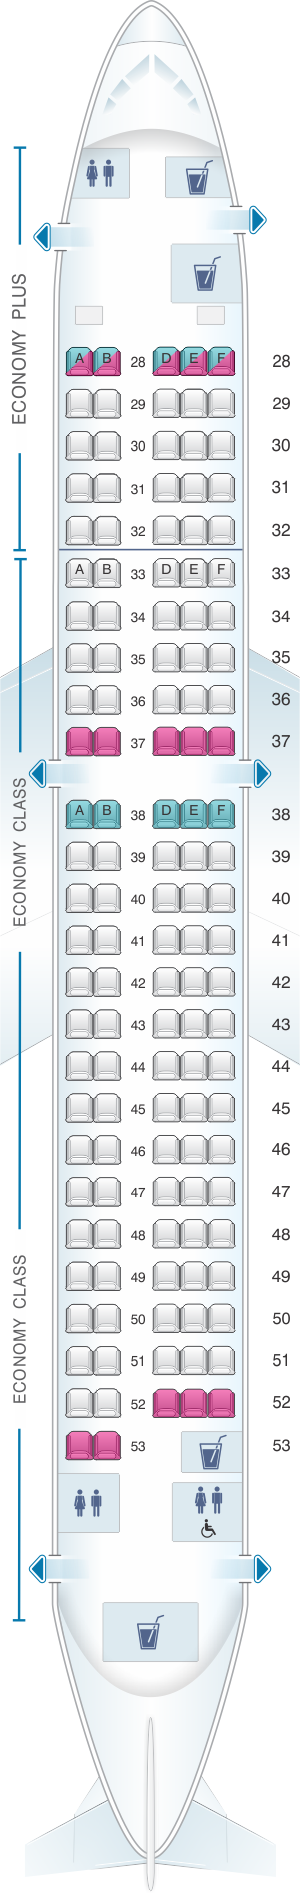 Seat map for Korean Air Airbus A220 300 v1